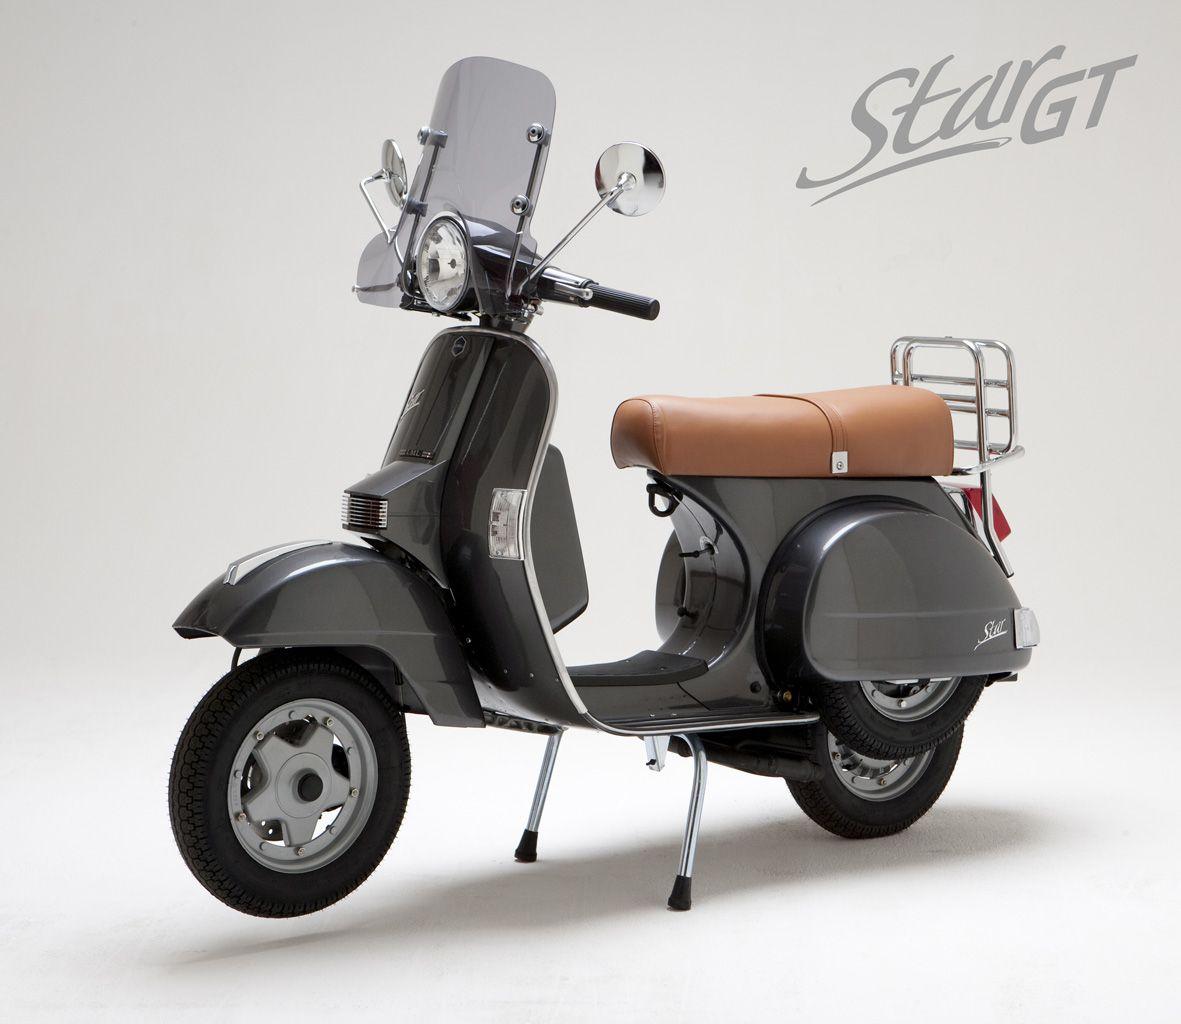 el lml 125 4t automatic motor amp bikes vespa scooters lml. Black Bedroom Furniture Sets. Home Design Ideas